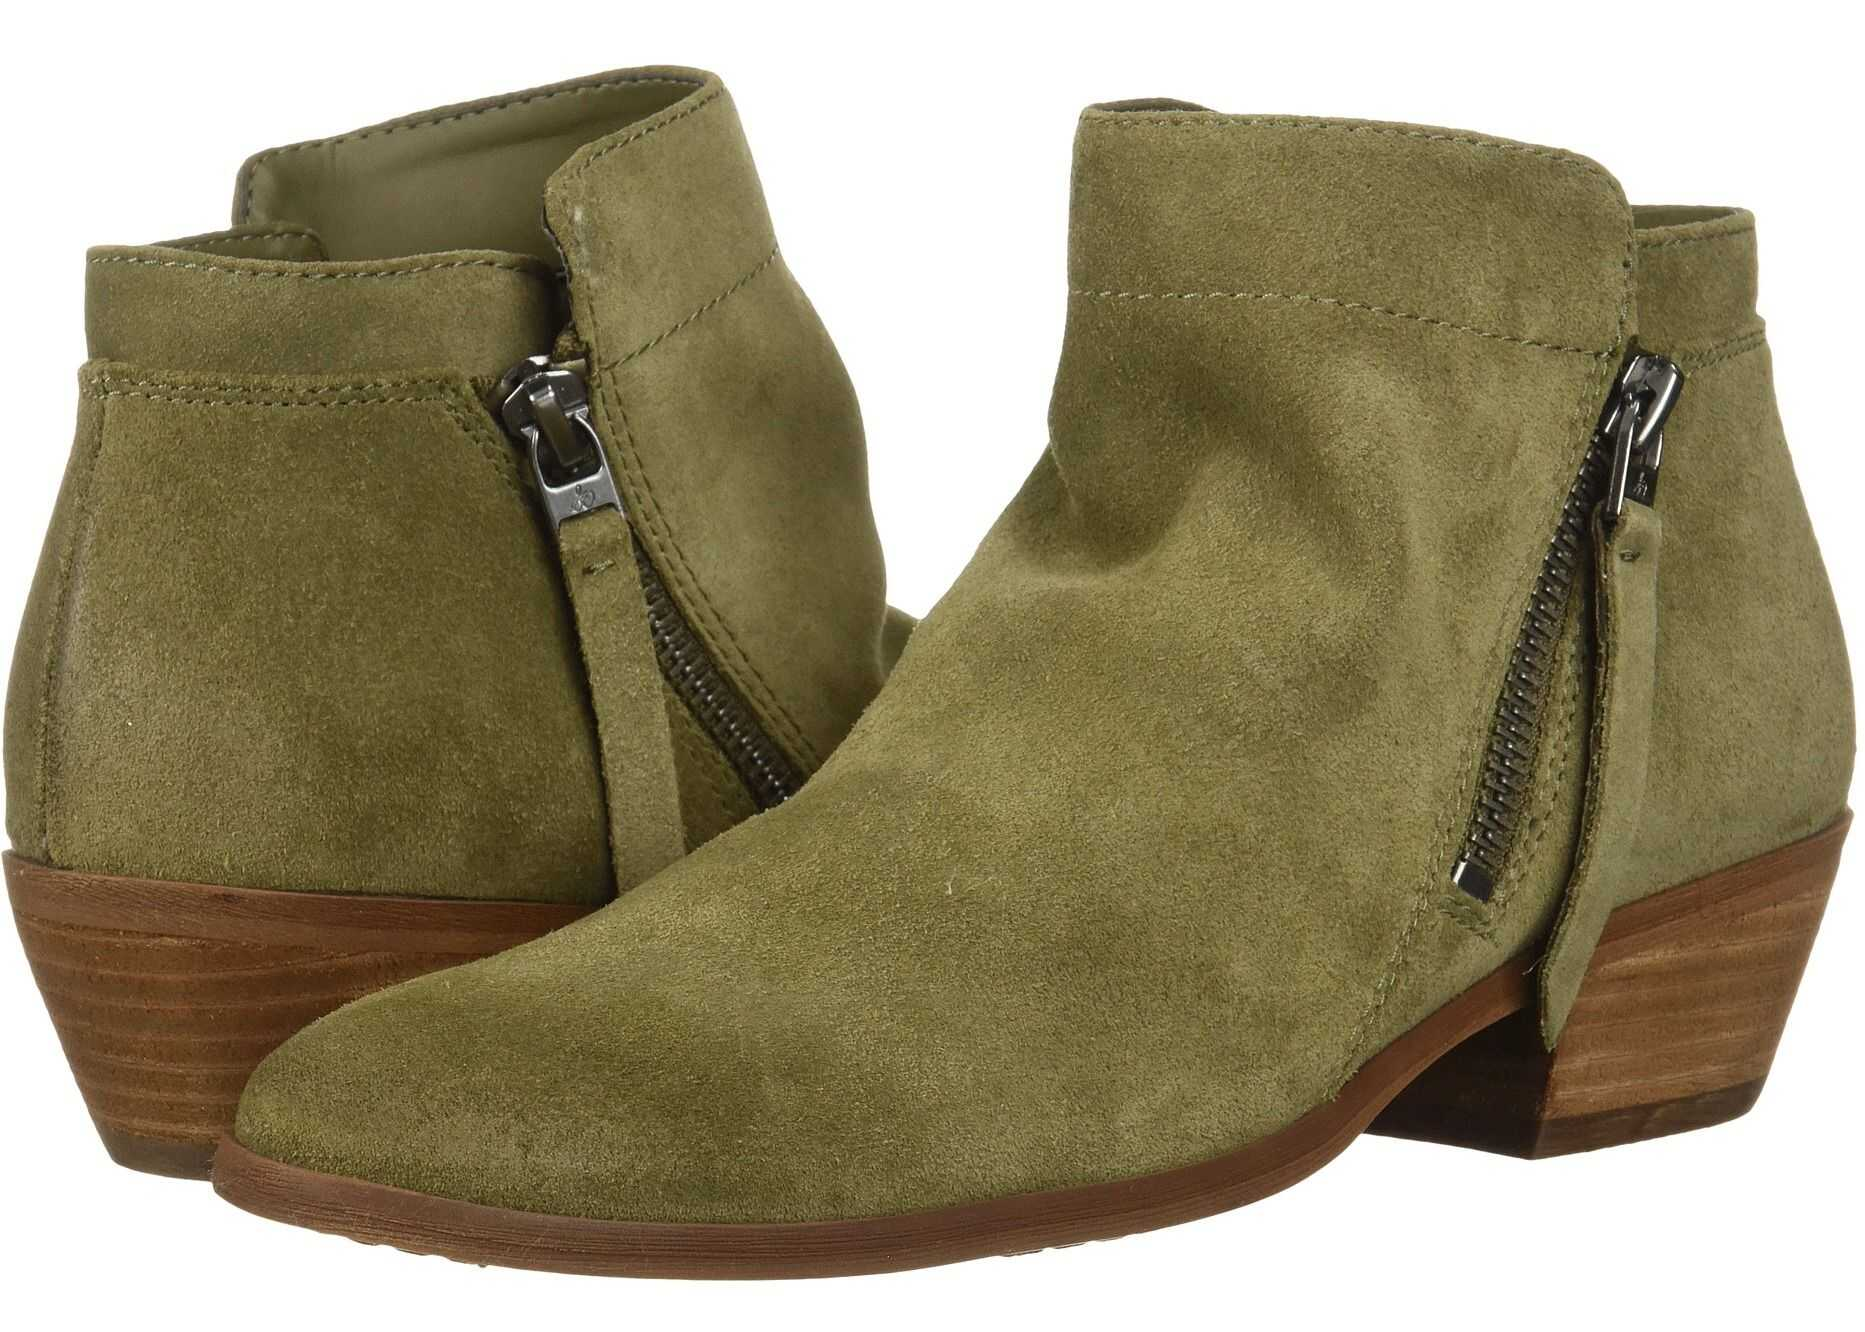 Sam Edelman Packer Moss Green Velutto Suede Leather